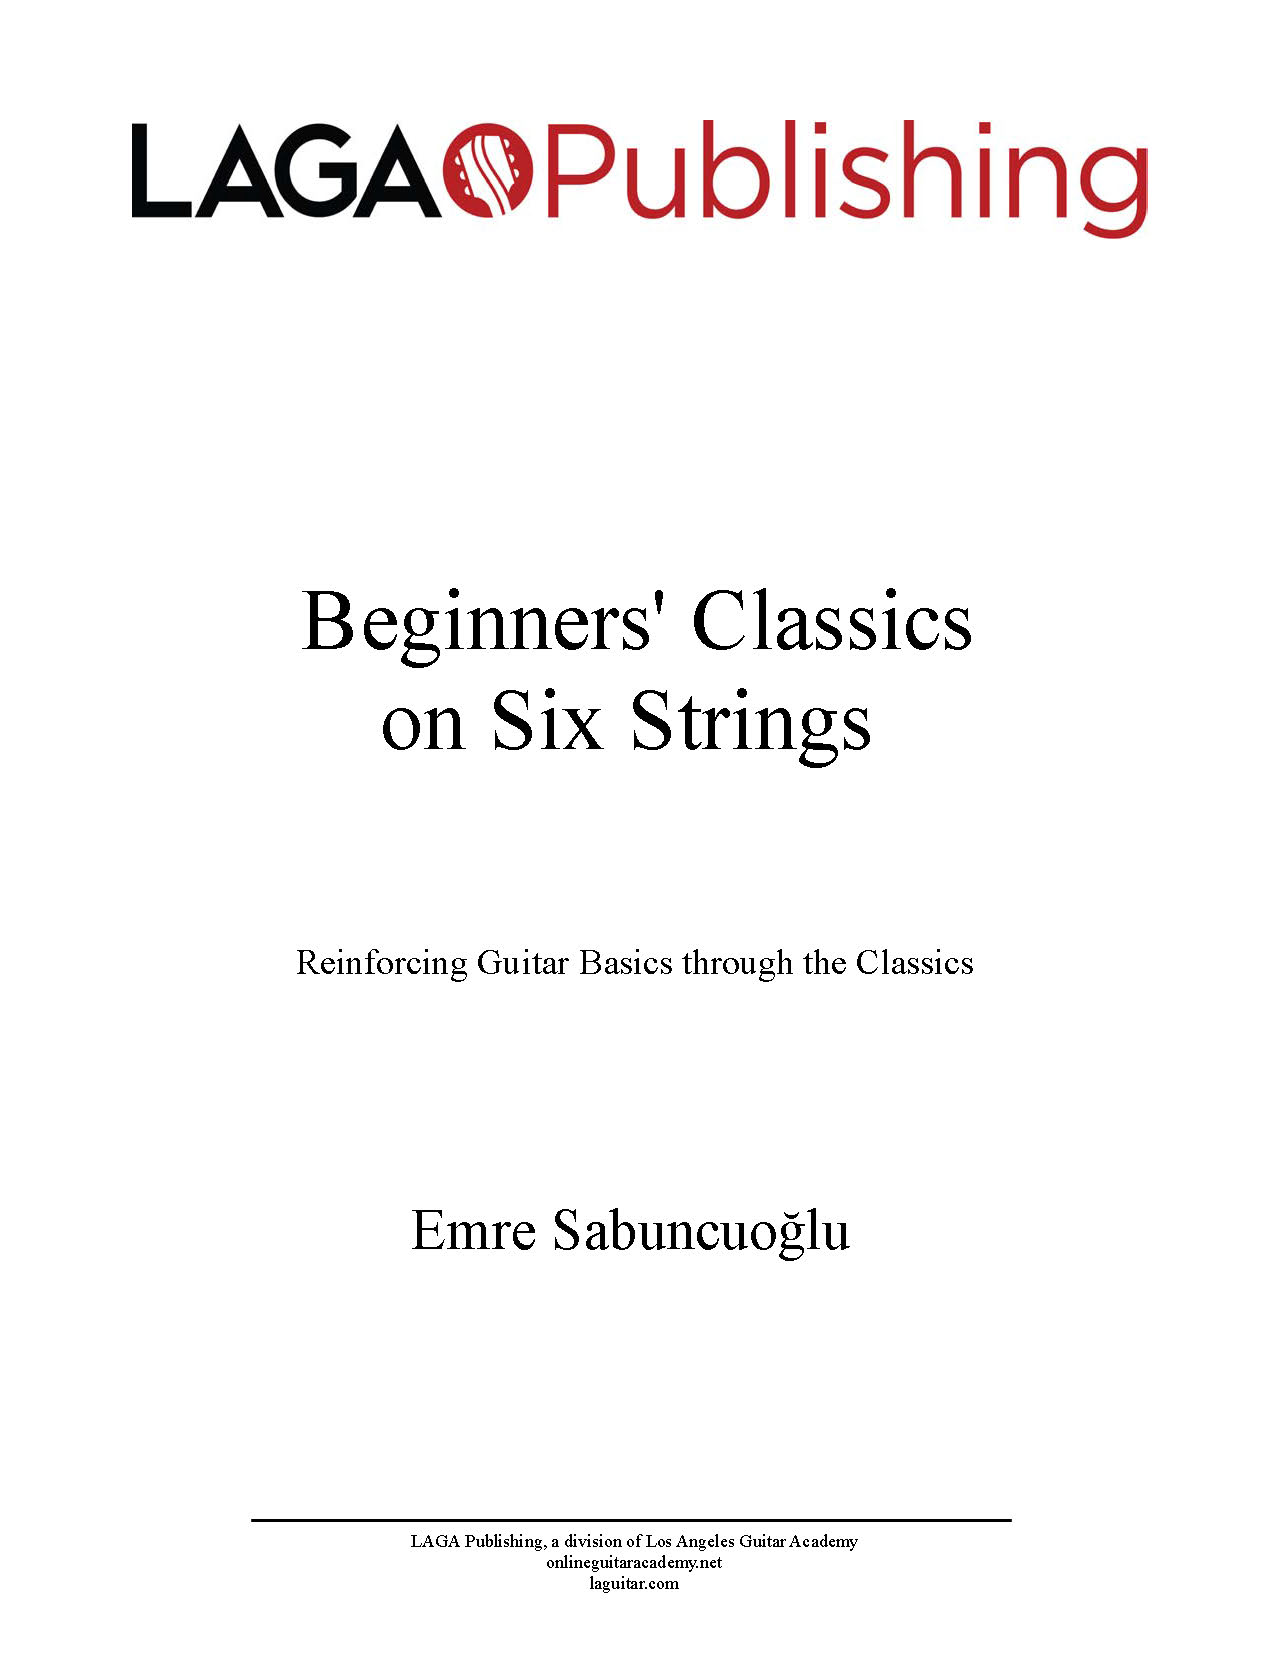 LAGA-Publishing-Beginners-Classics_Page_01